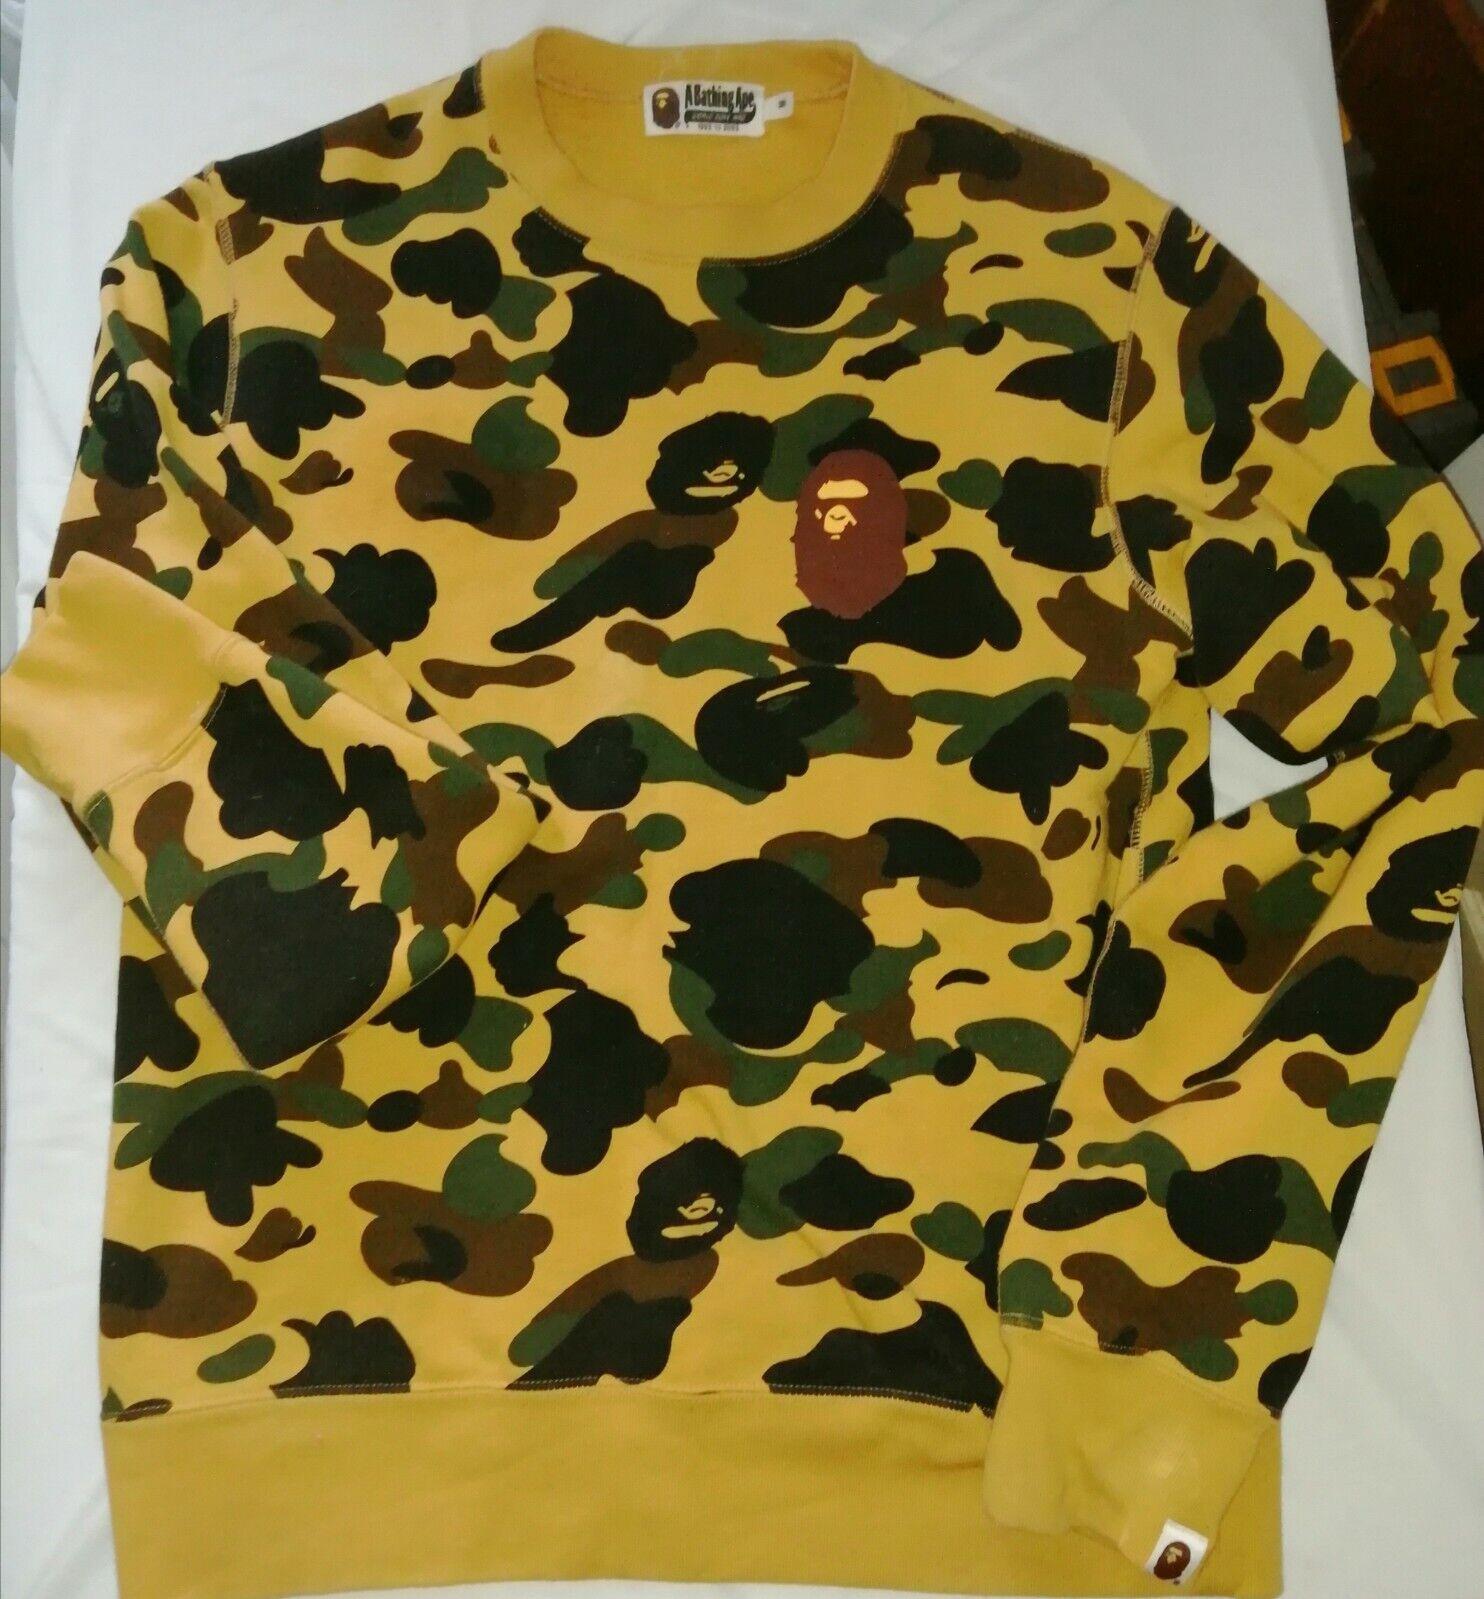 A BATHING APE 1st CAMO yellow SWEATSHIRT sweater BAPE CAMO Medium